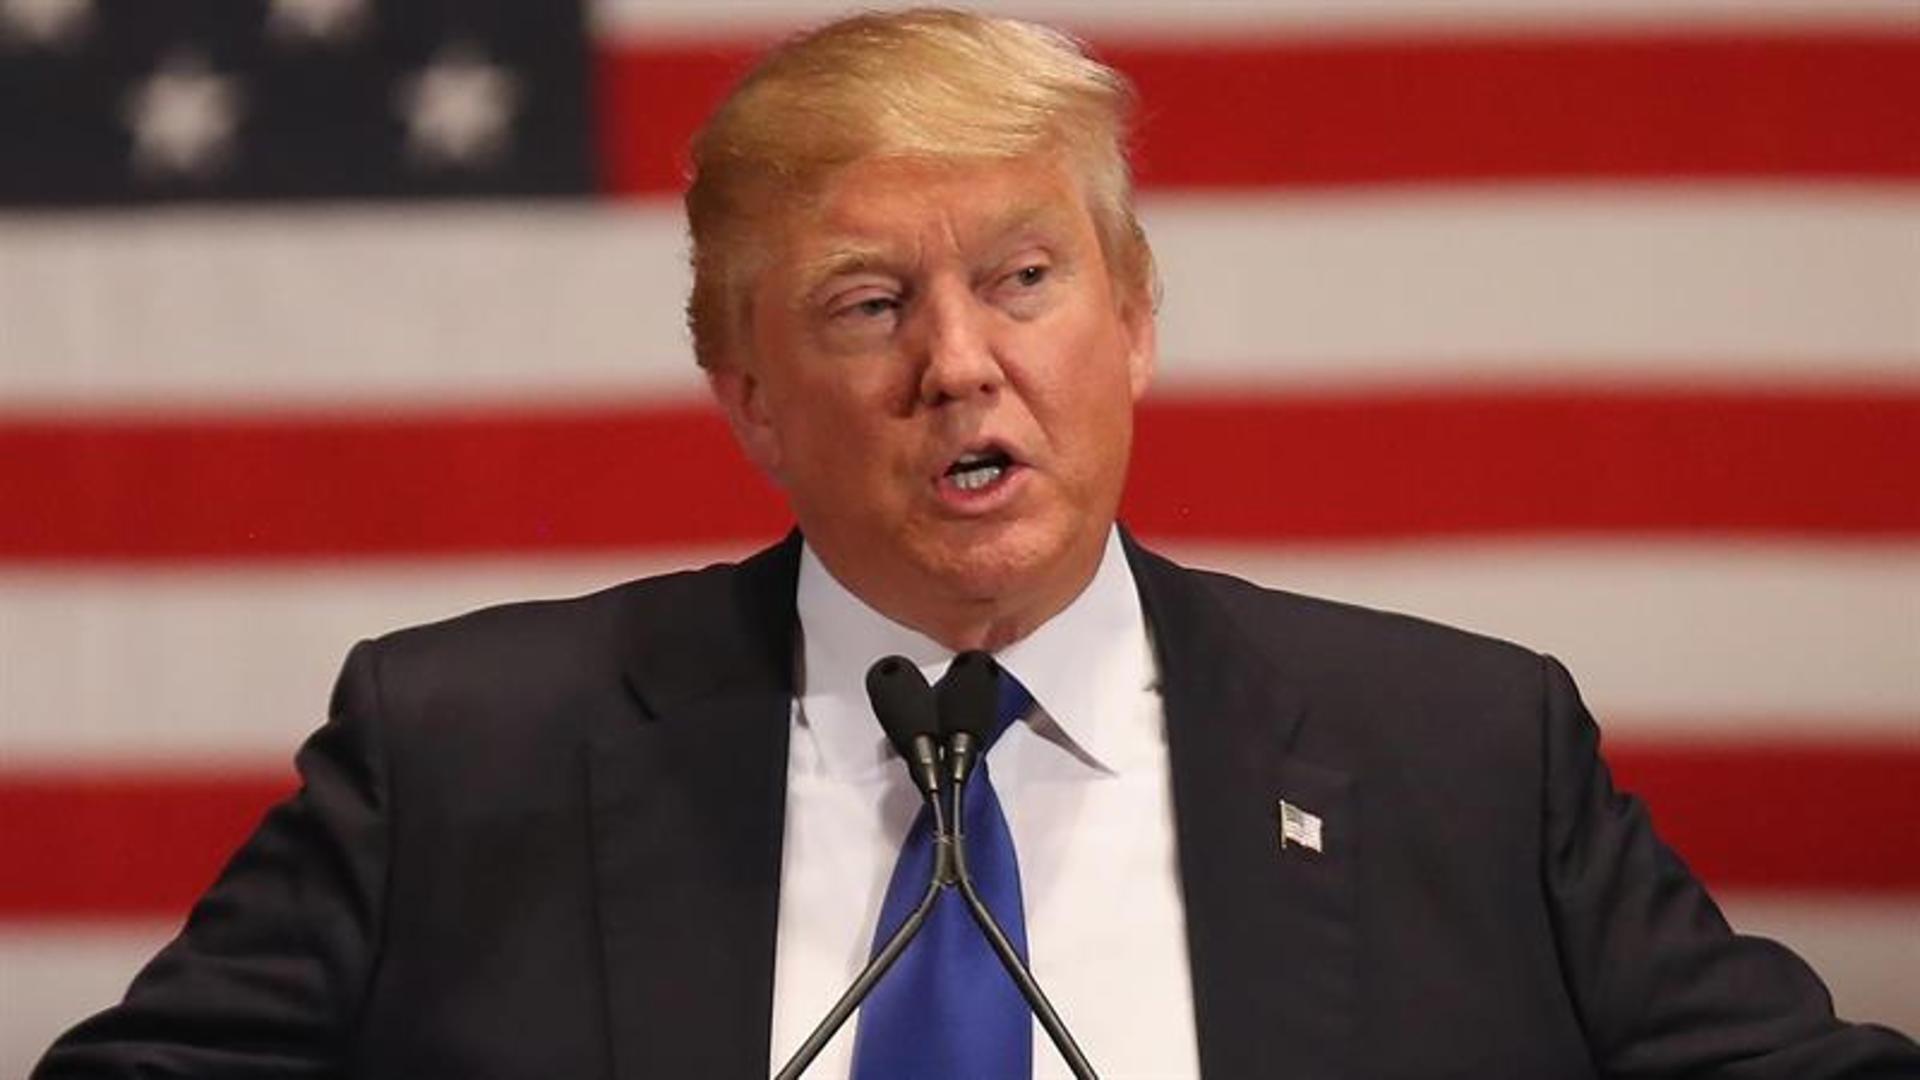 Donald Trump Calls On Obama To Resign Over Orlando Shooting